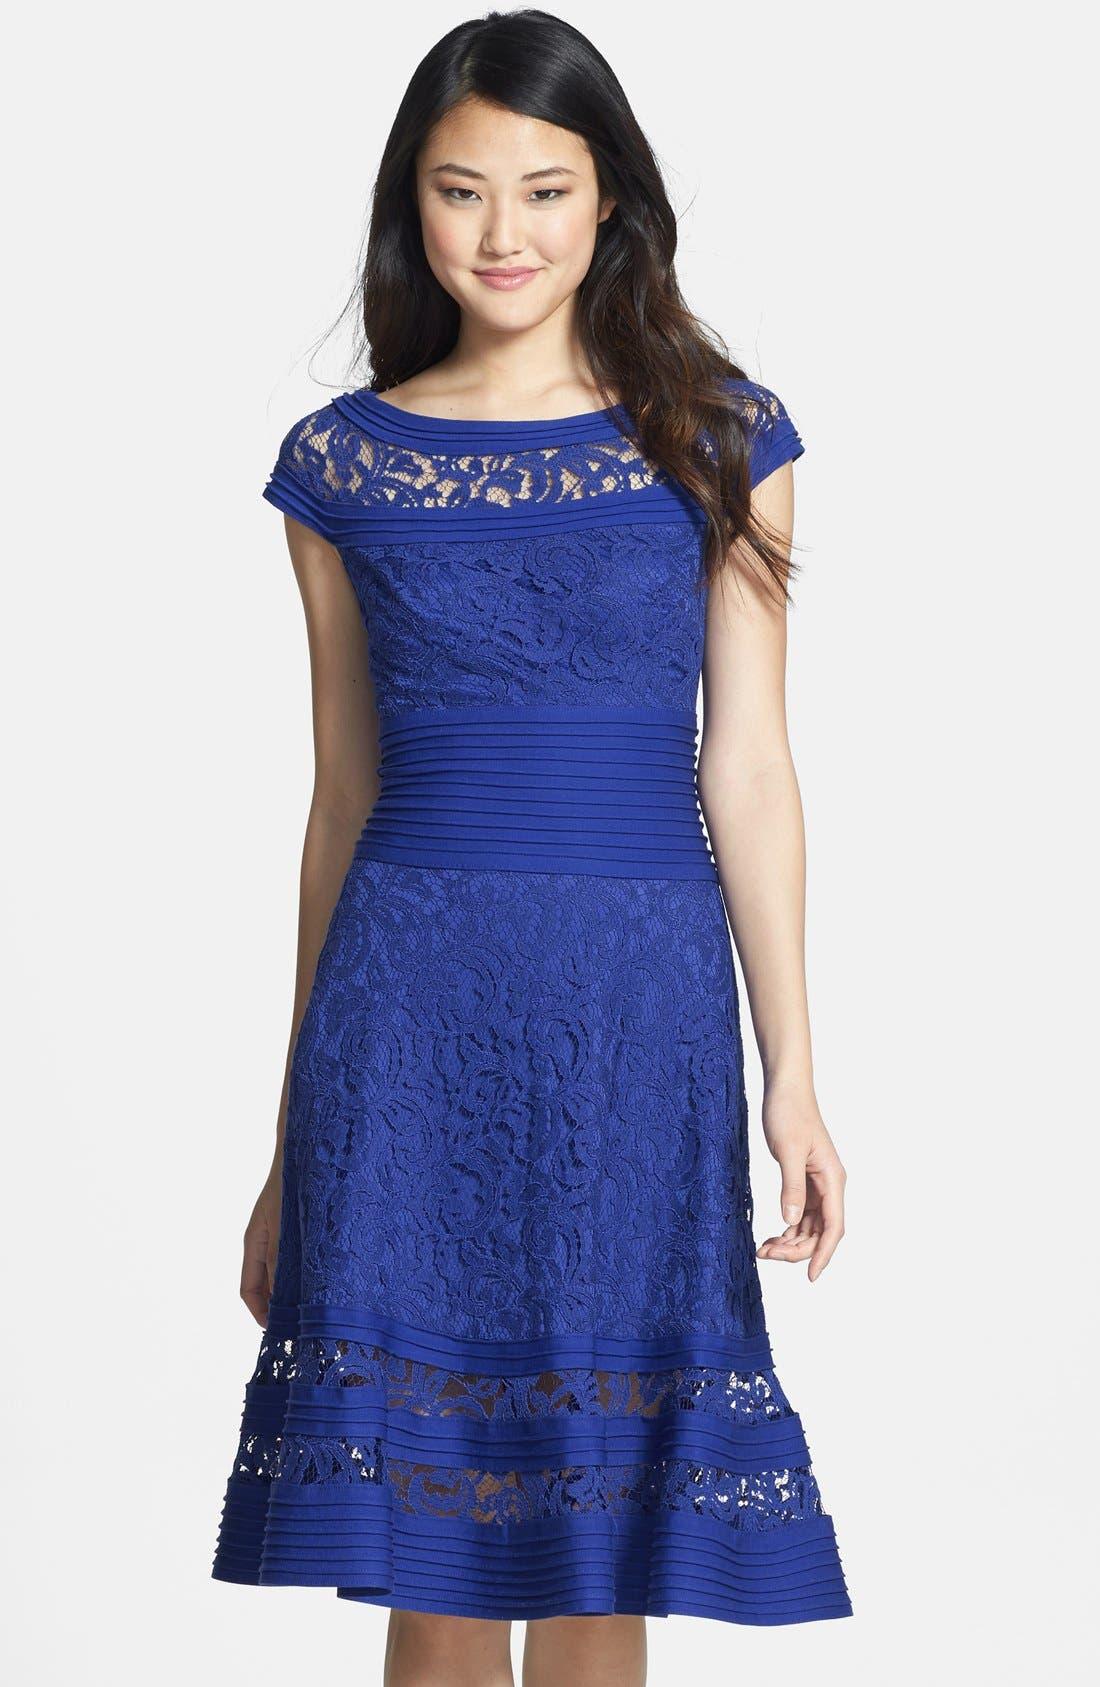 Alternate Image 1 Selected - Tadashi Shoji Cap Sleeve Lace Fit & Flare Dress (Regular & Petite)